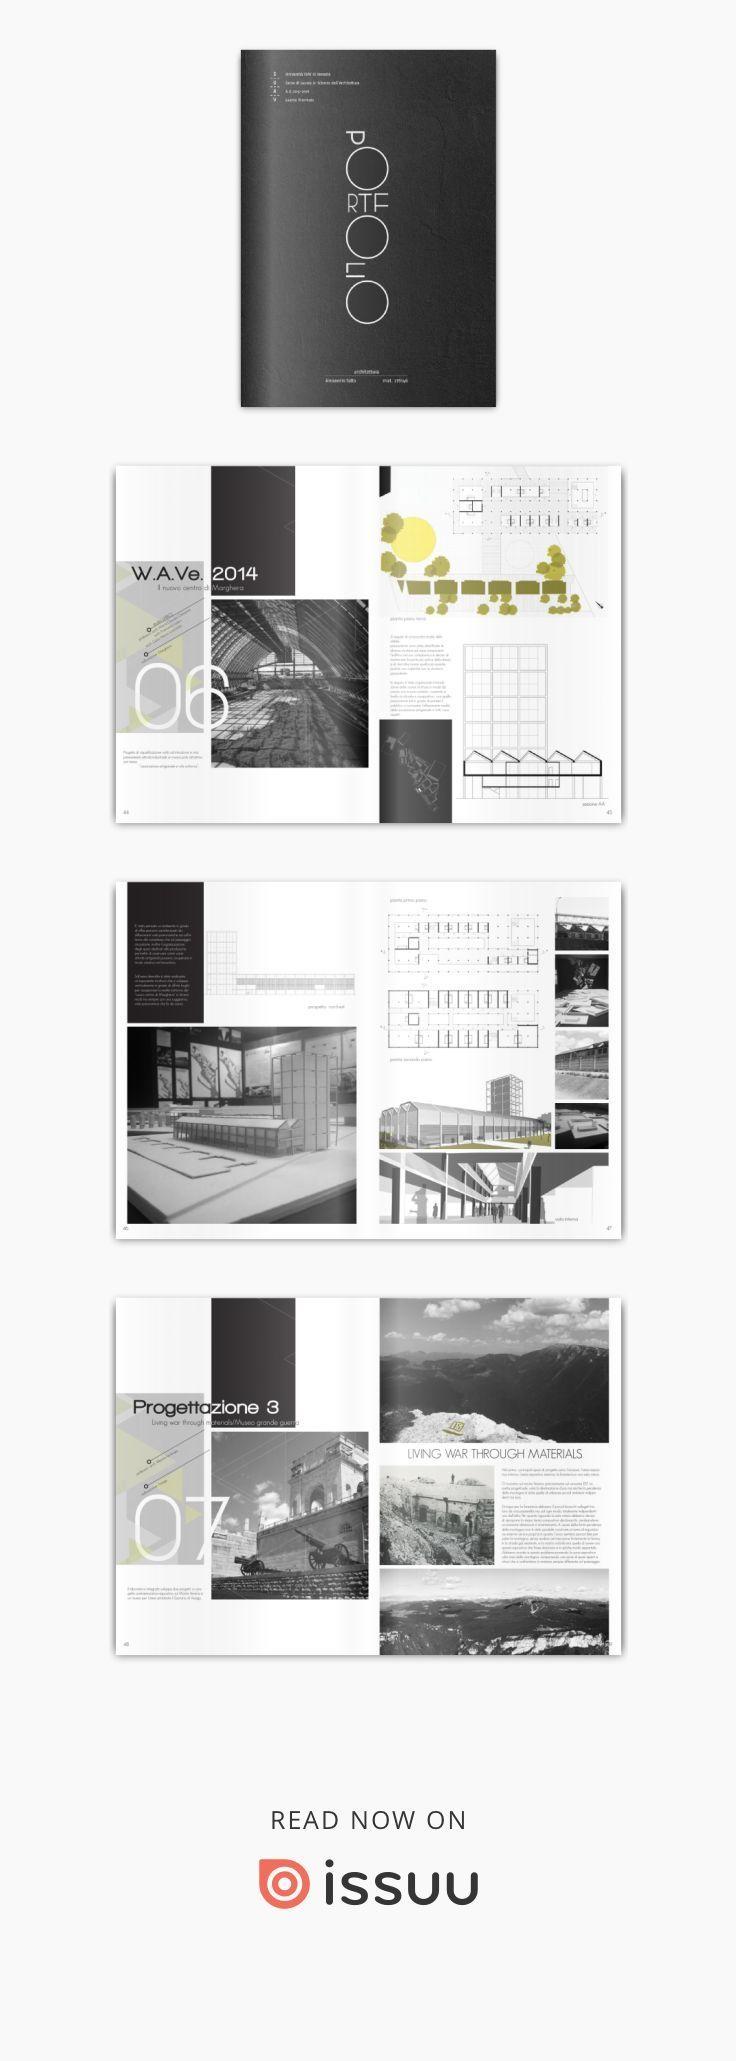 Portfolio d'architettura IUAV